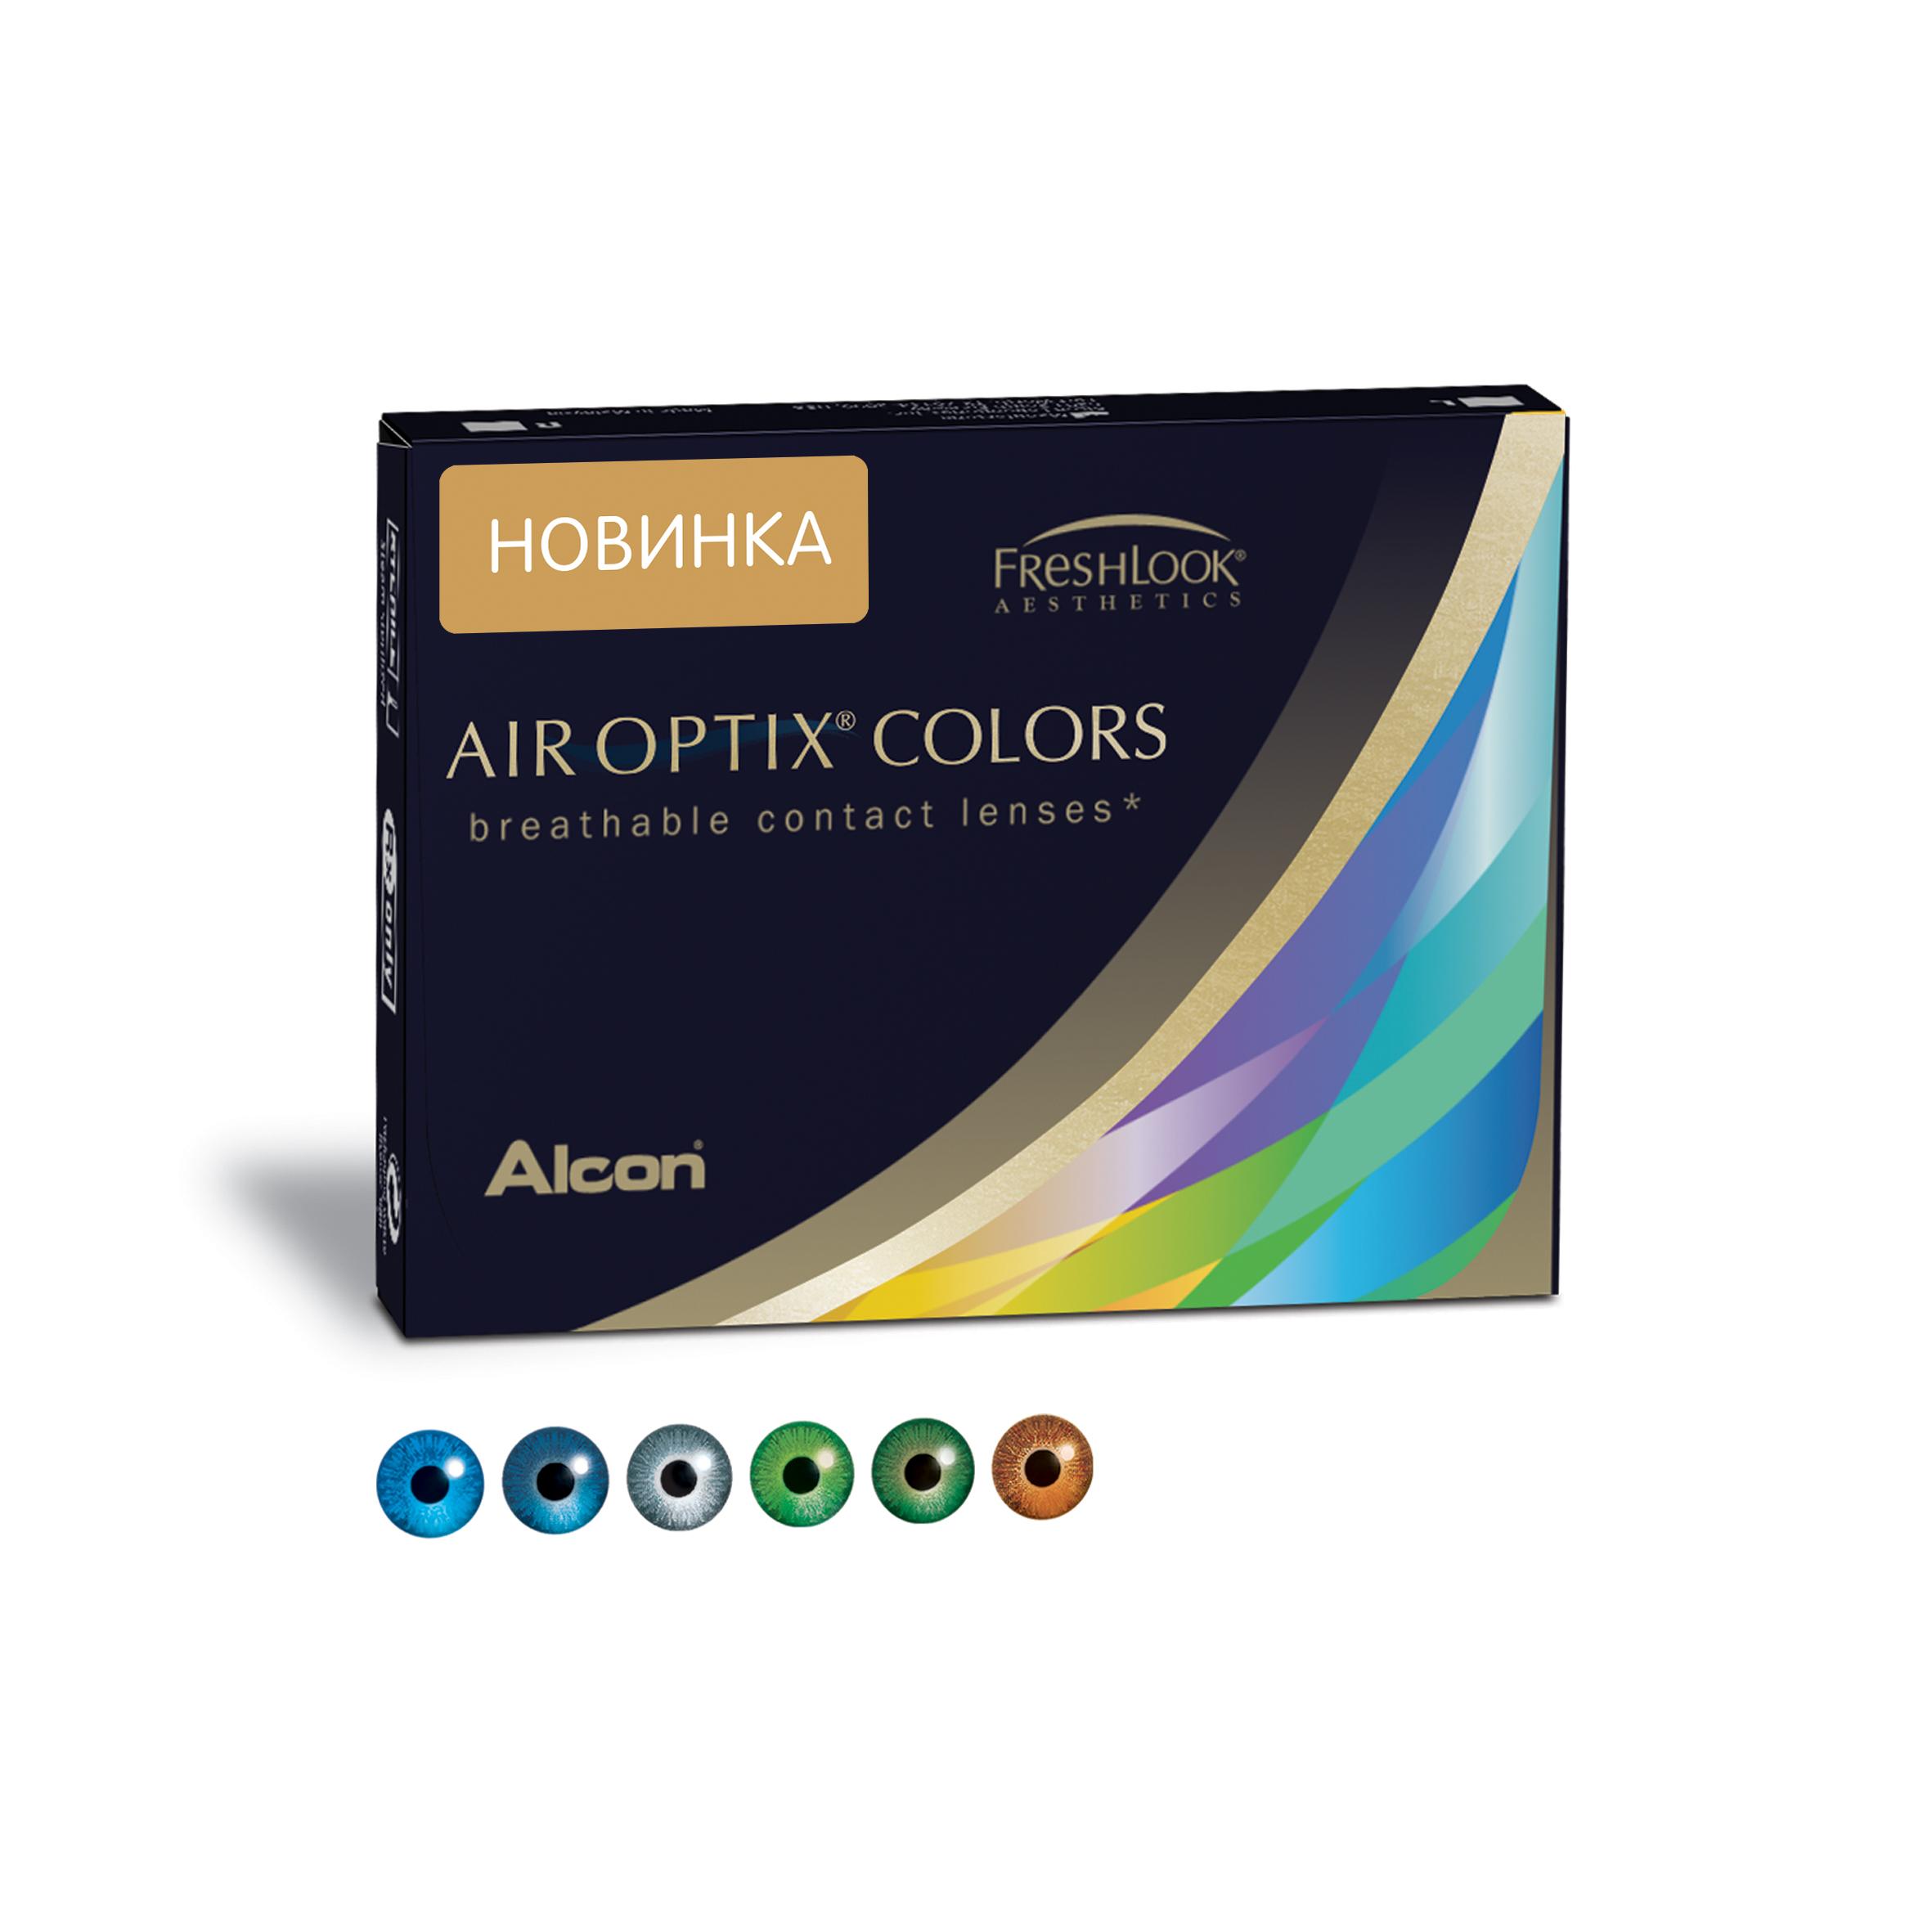 Аlcon контактные линзы Air Optix Colors 2 шт -3.75 Brilliant Blue ( 31746221 )